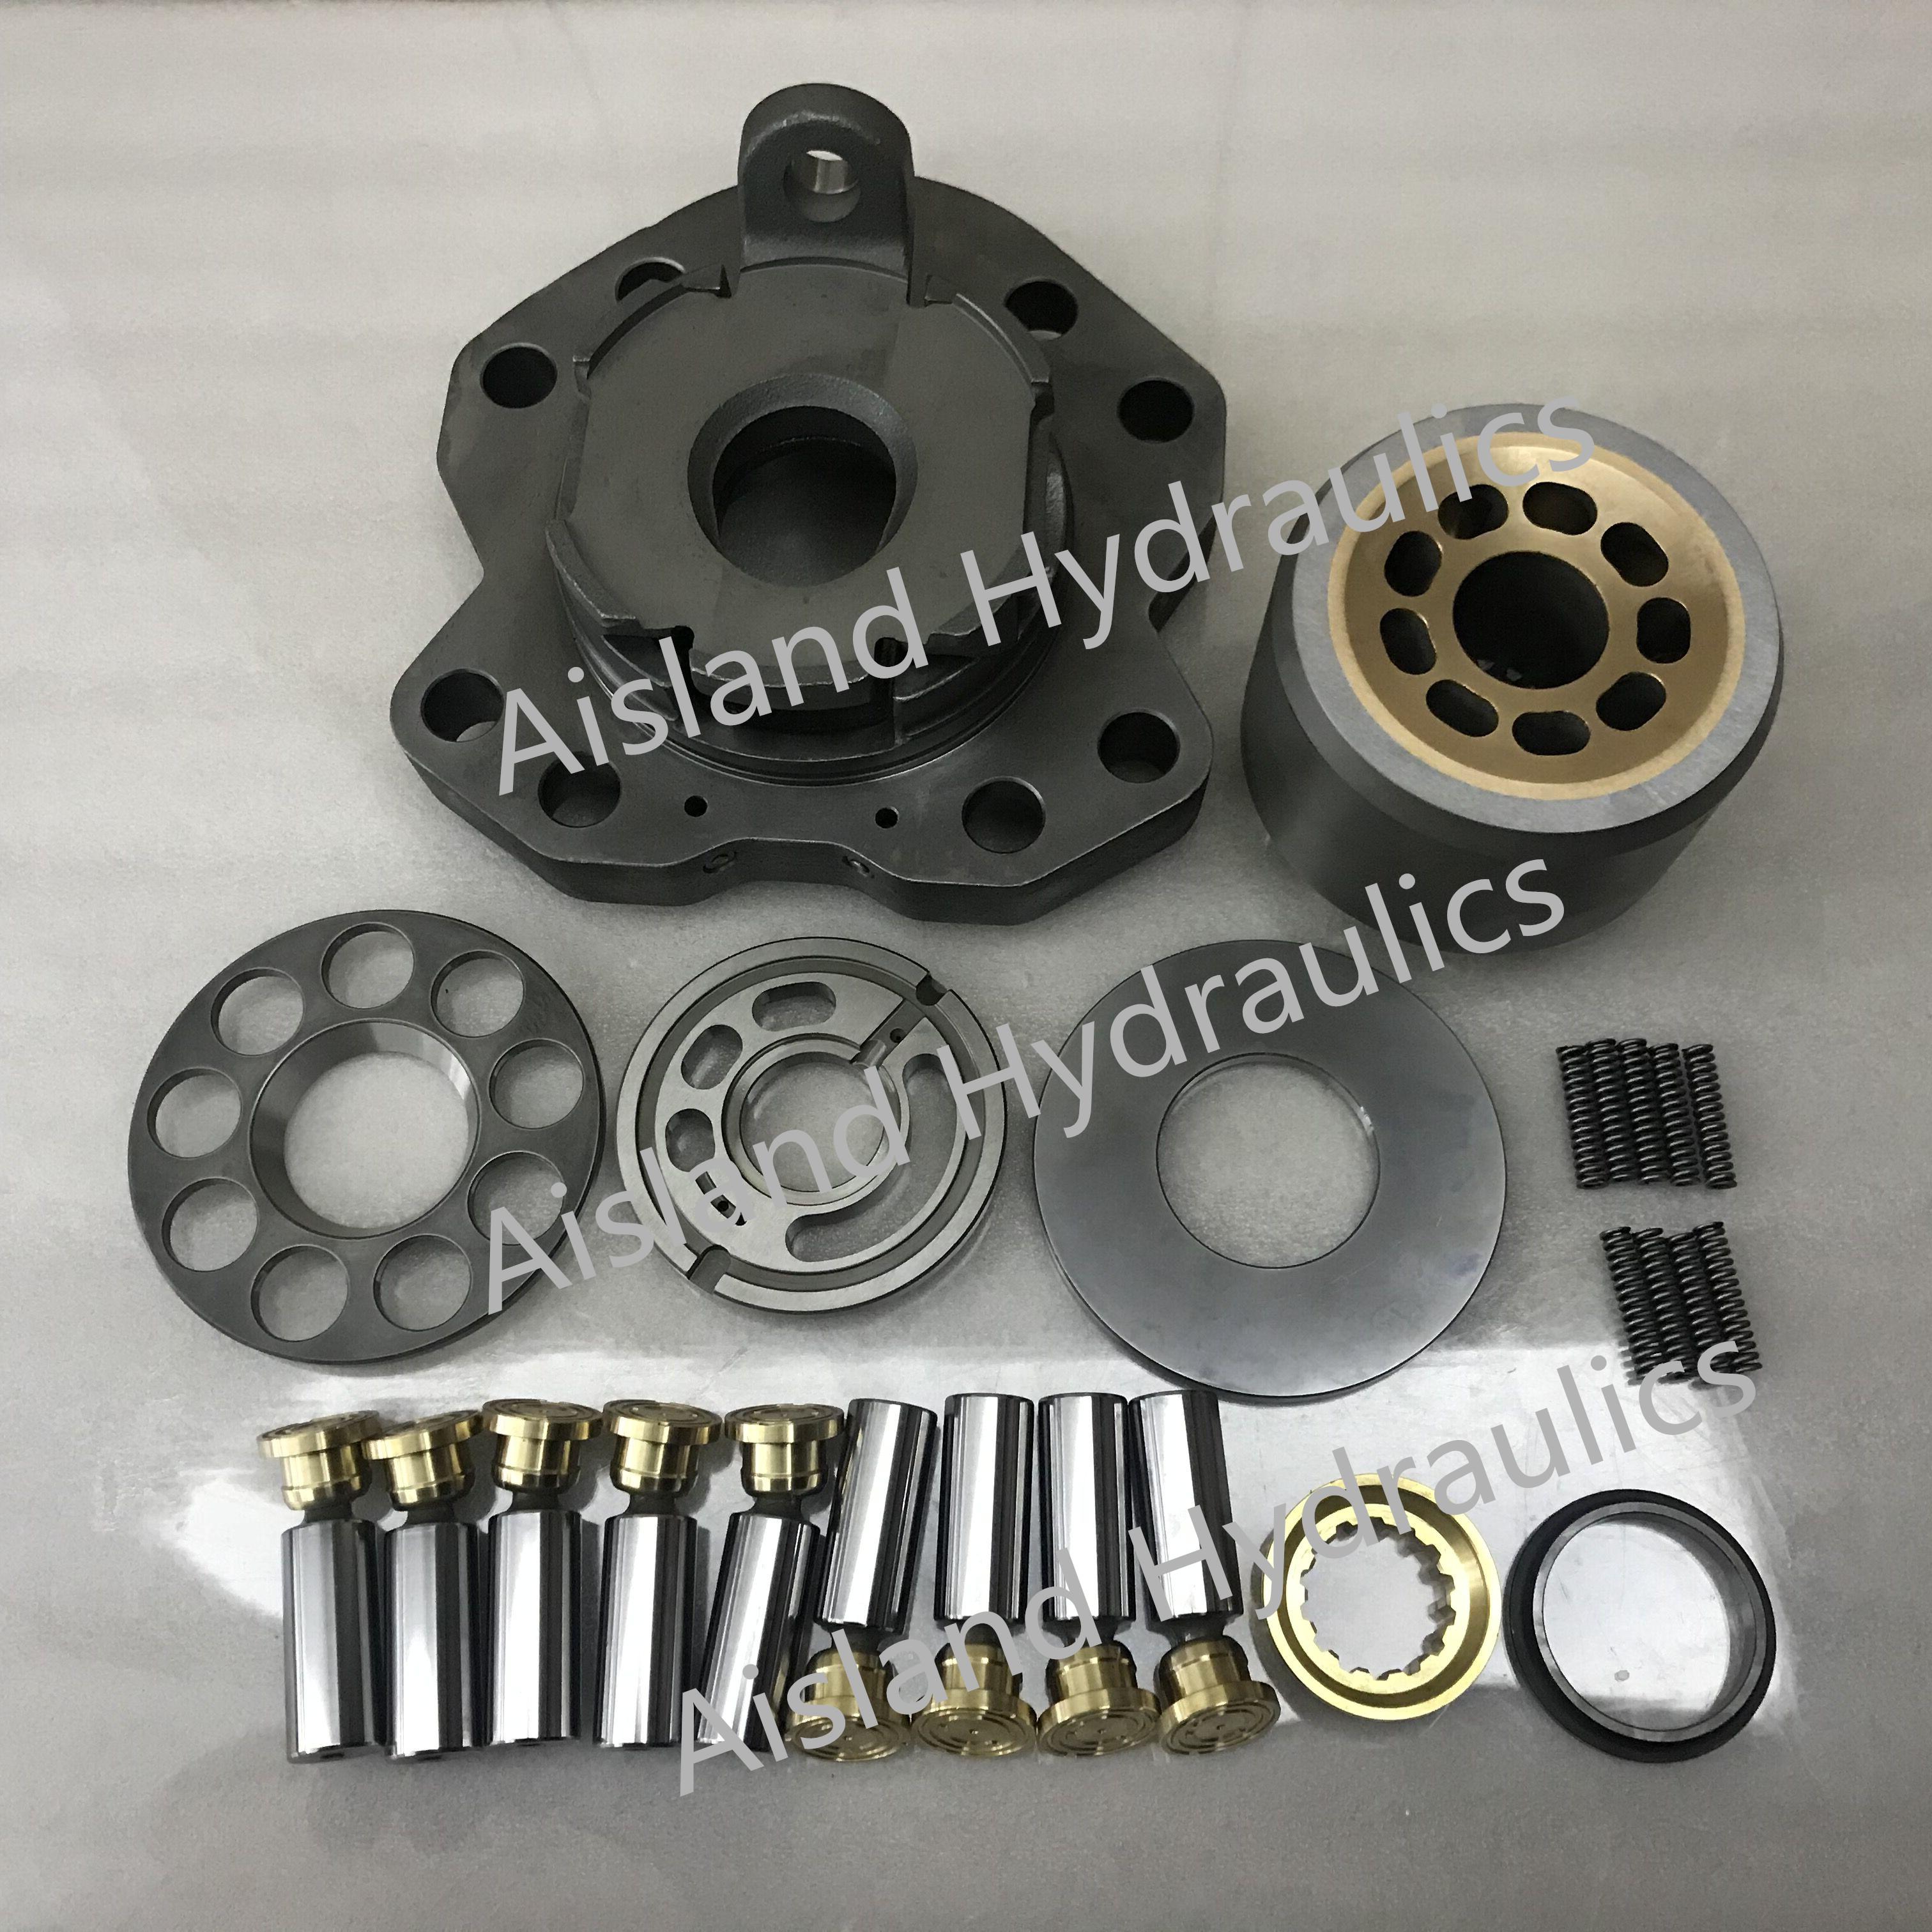 Kawasaki pump spare parts K3V45 K3V63 K3V112 K3V140 K3V180 K3V280 for excavator